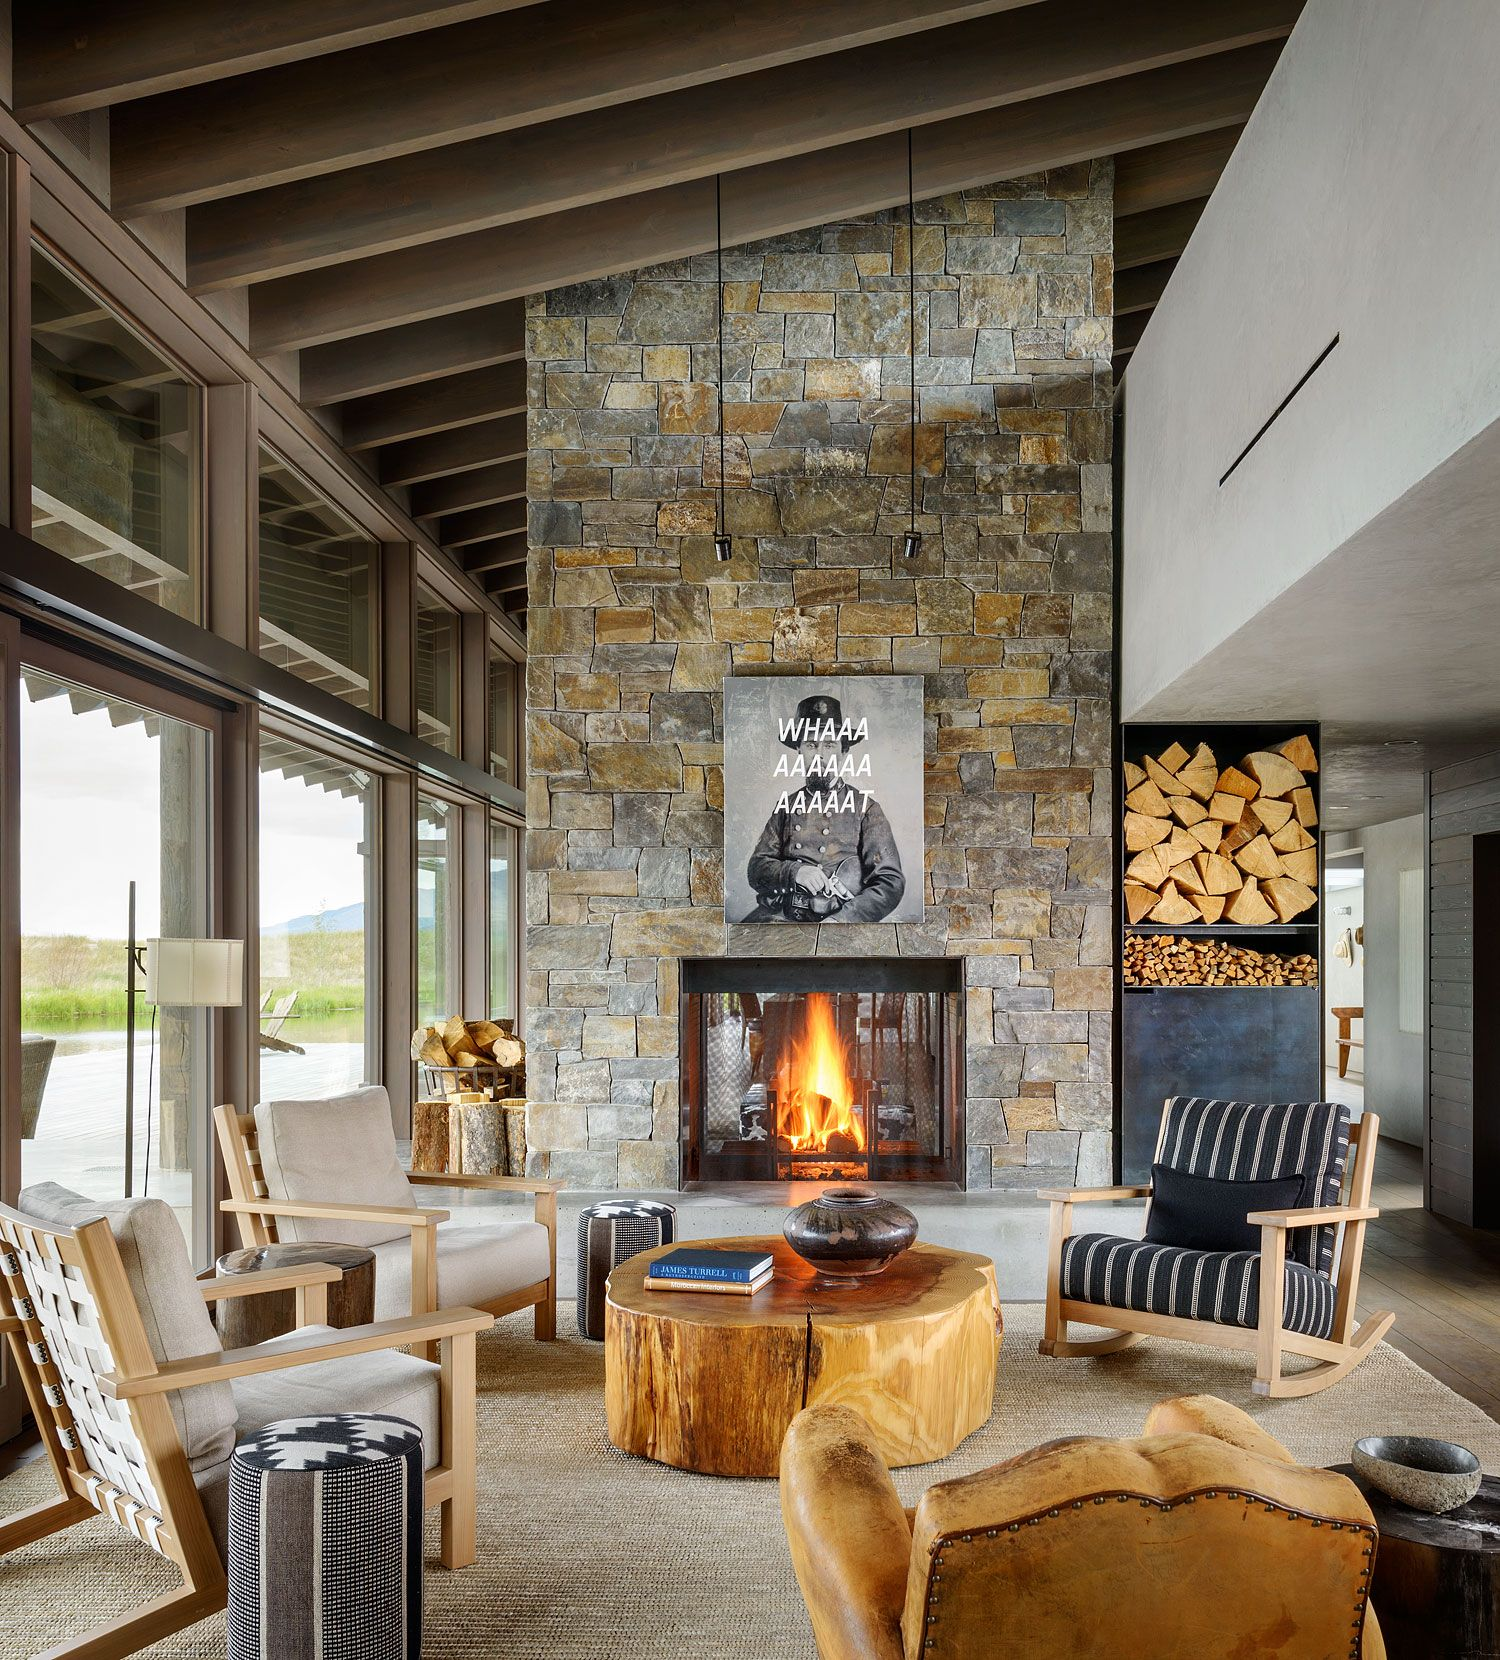 51 Modern Living Room Design From Talented Architects: Christian Grevstad Interior Design